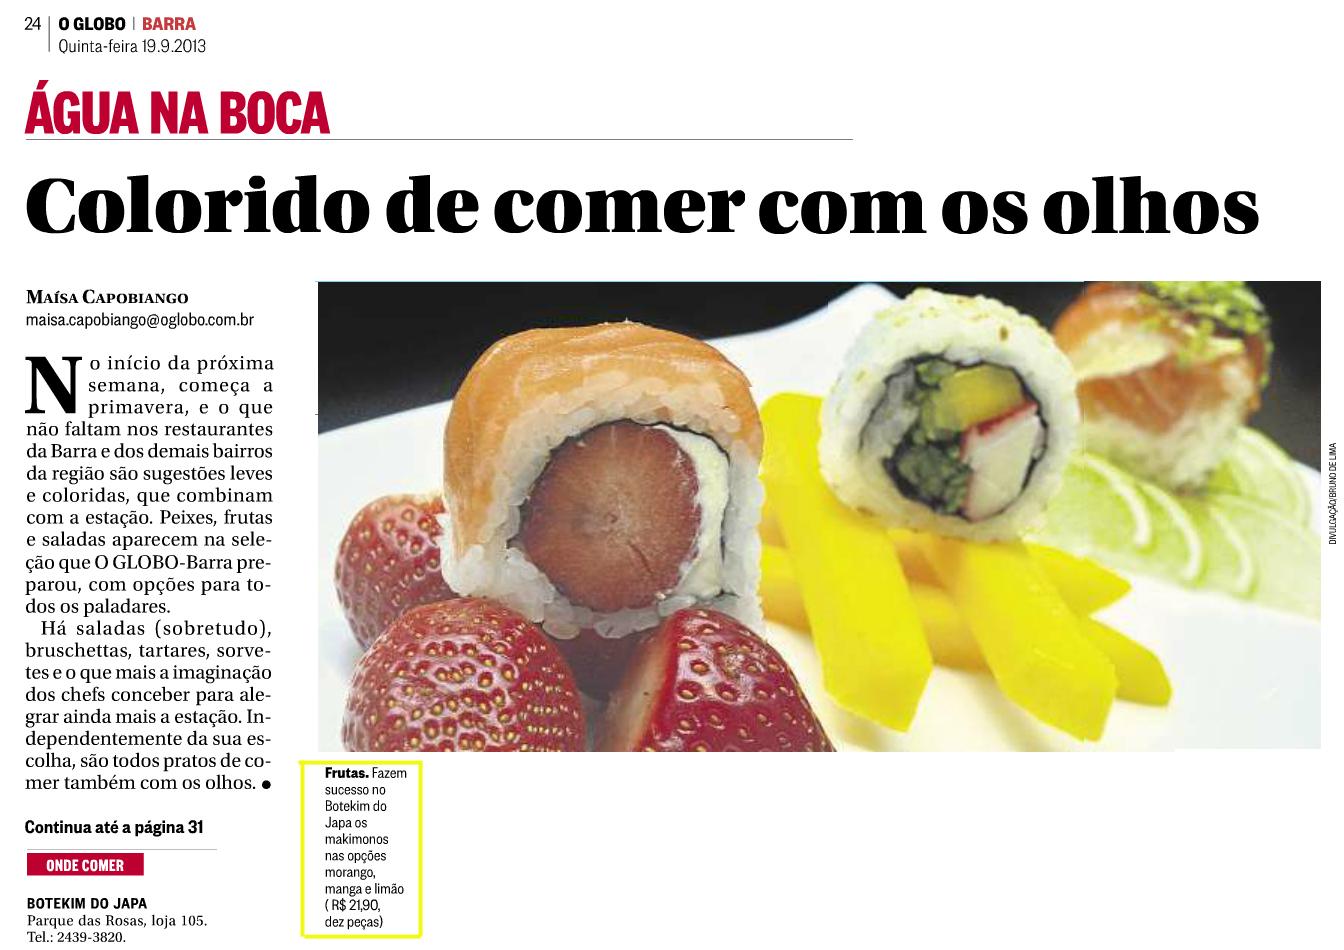 Globo Barra 19.09.13